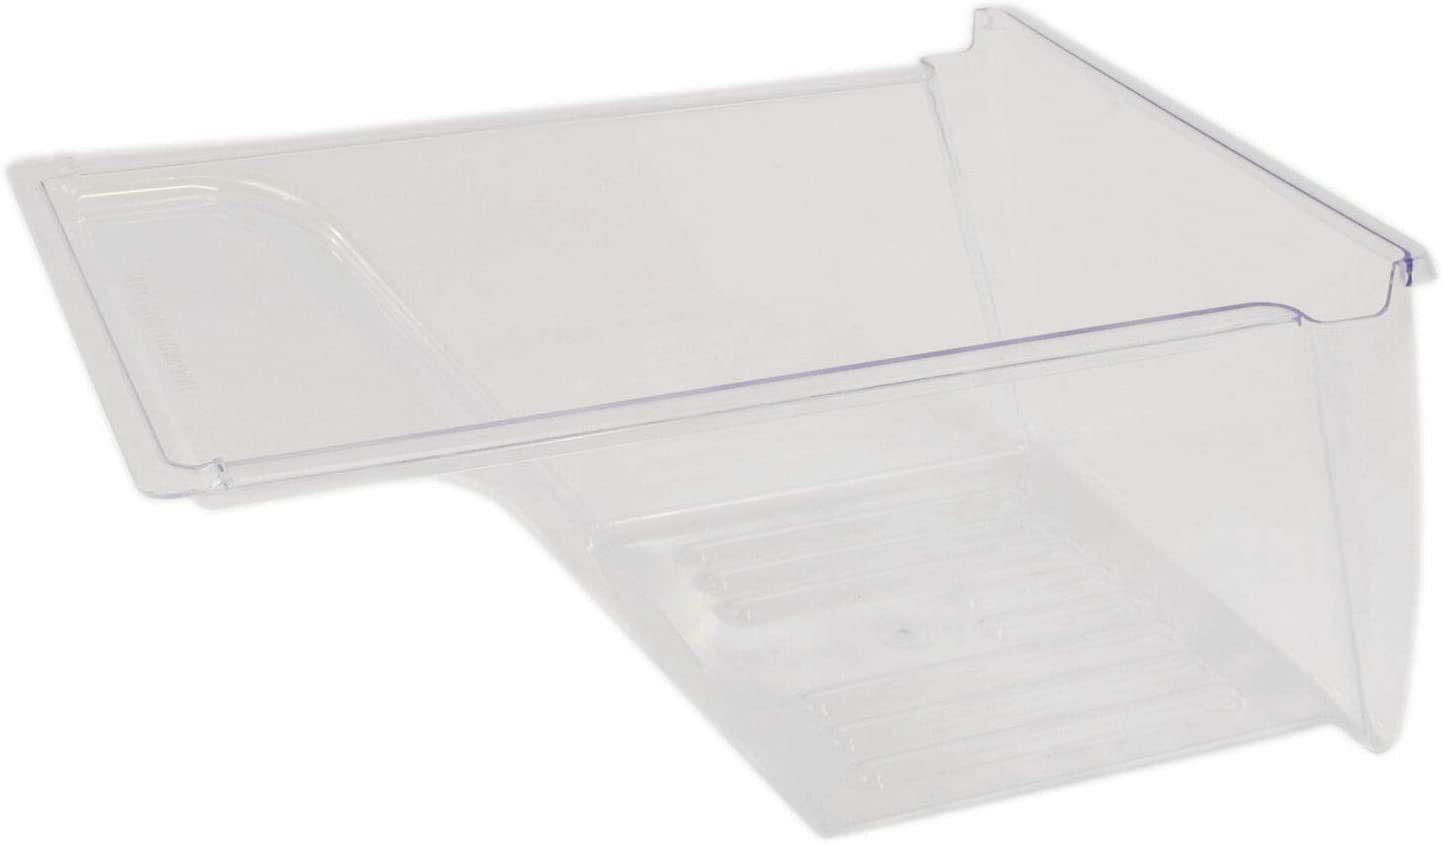 Crisper Drawer Fits For Frigidaire Refrigerator Clear Crisper Pan 240337103 PS429854